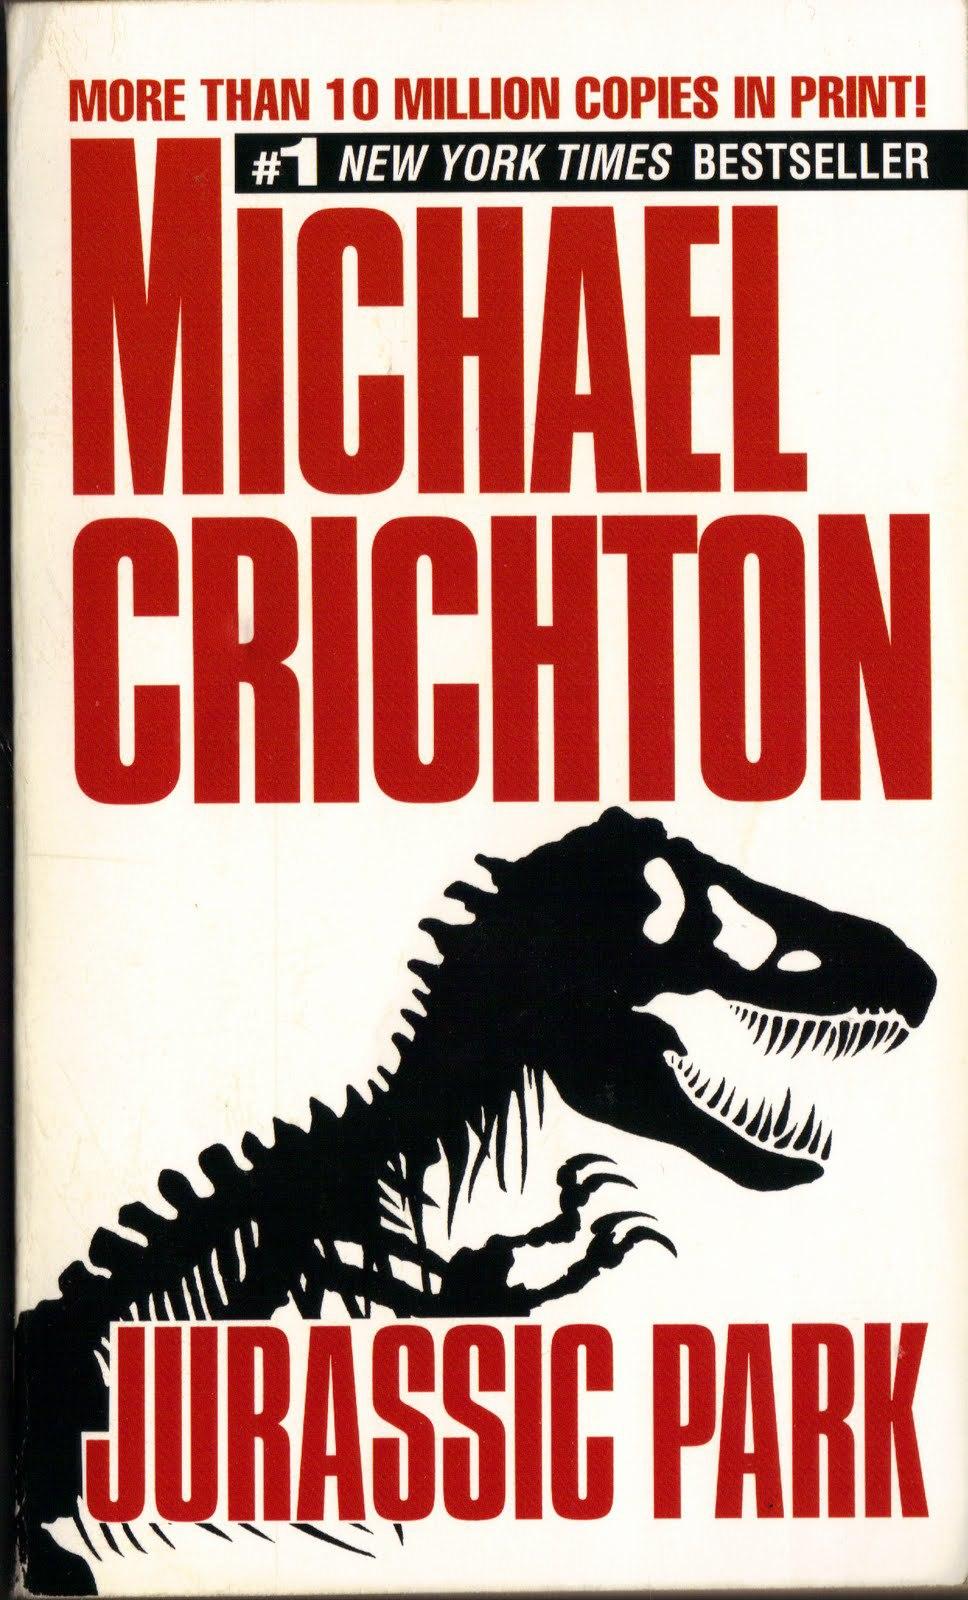 Jurassic Park Michael Crichton.JPG